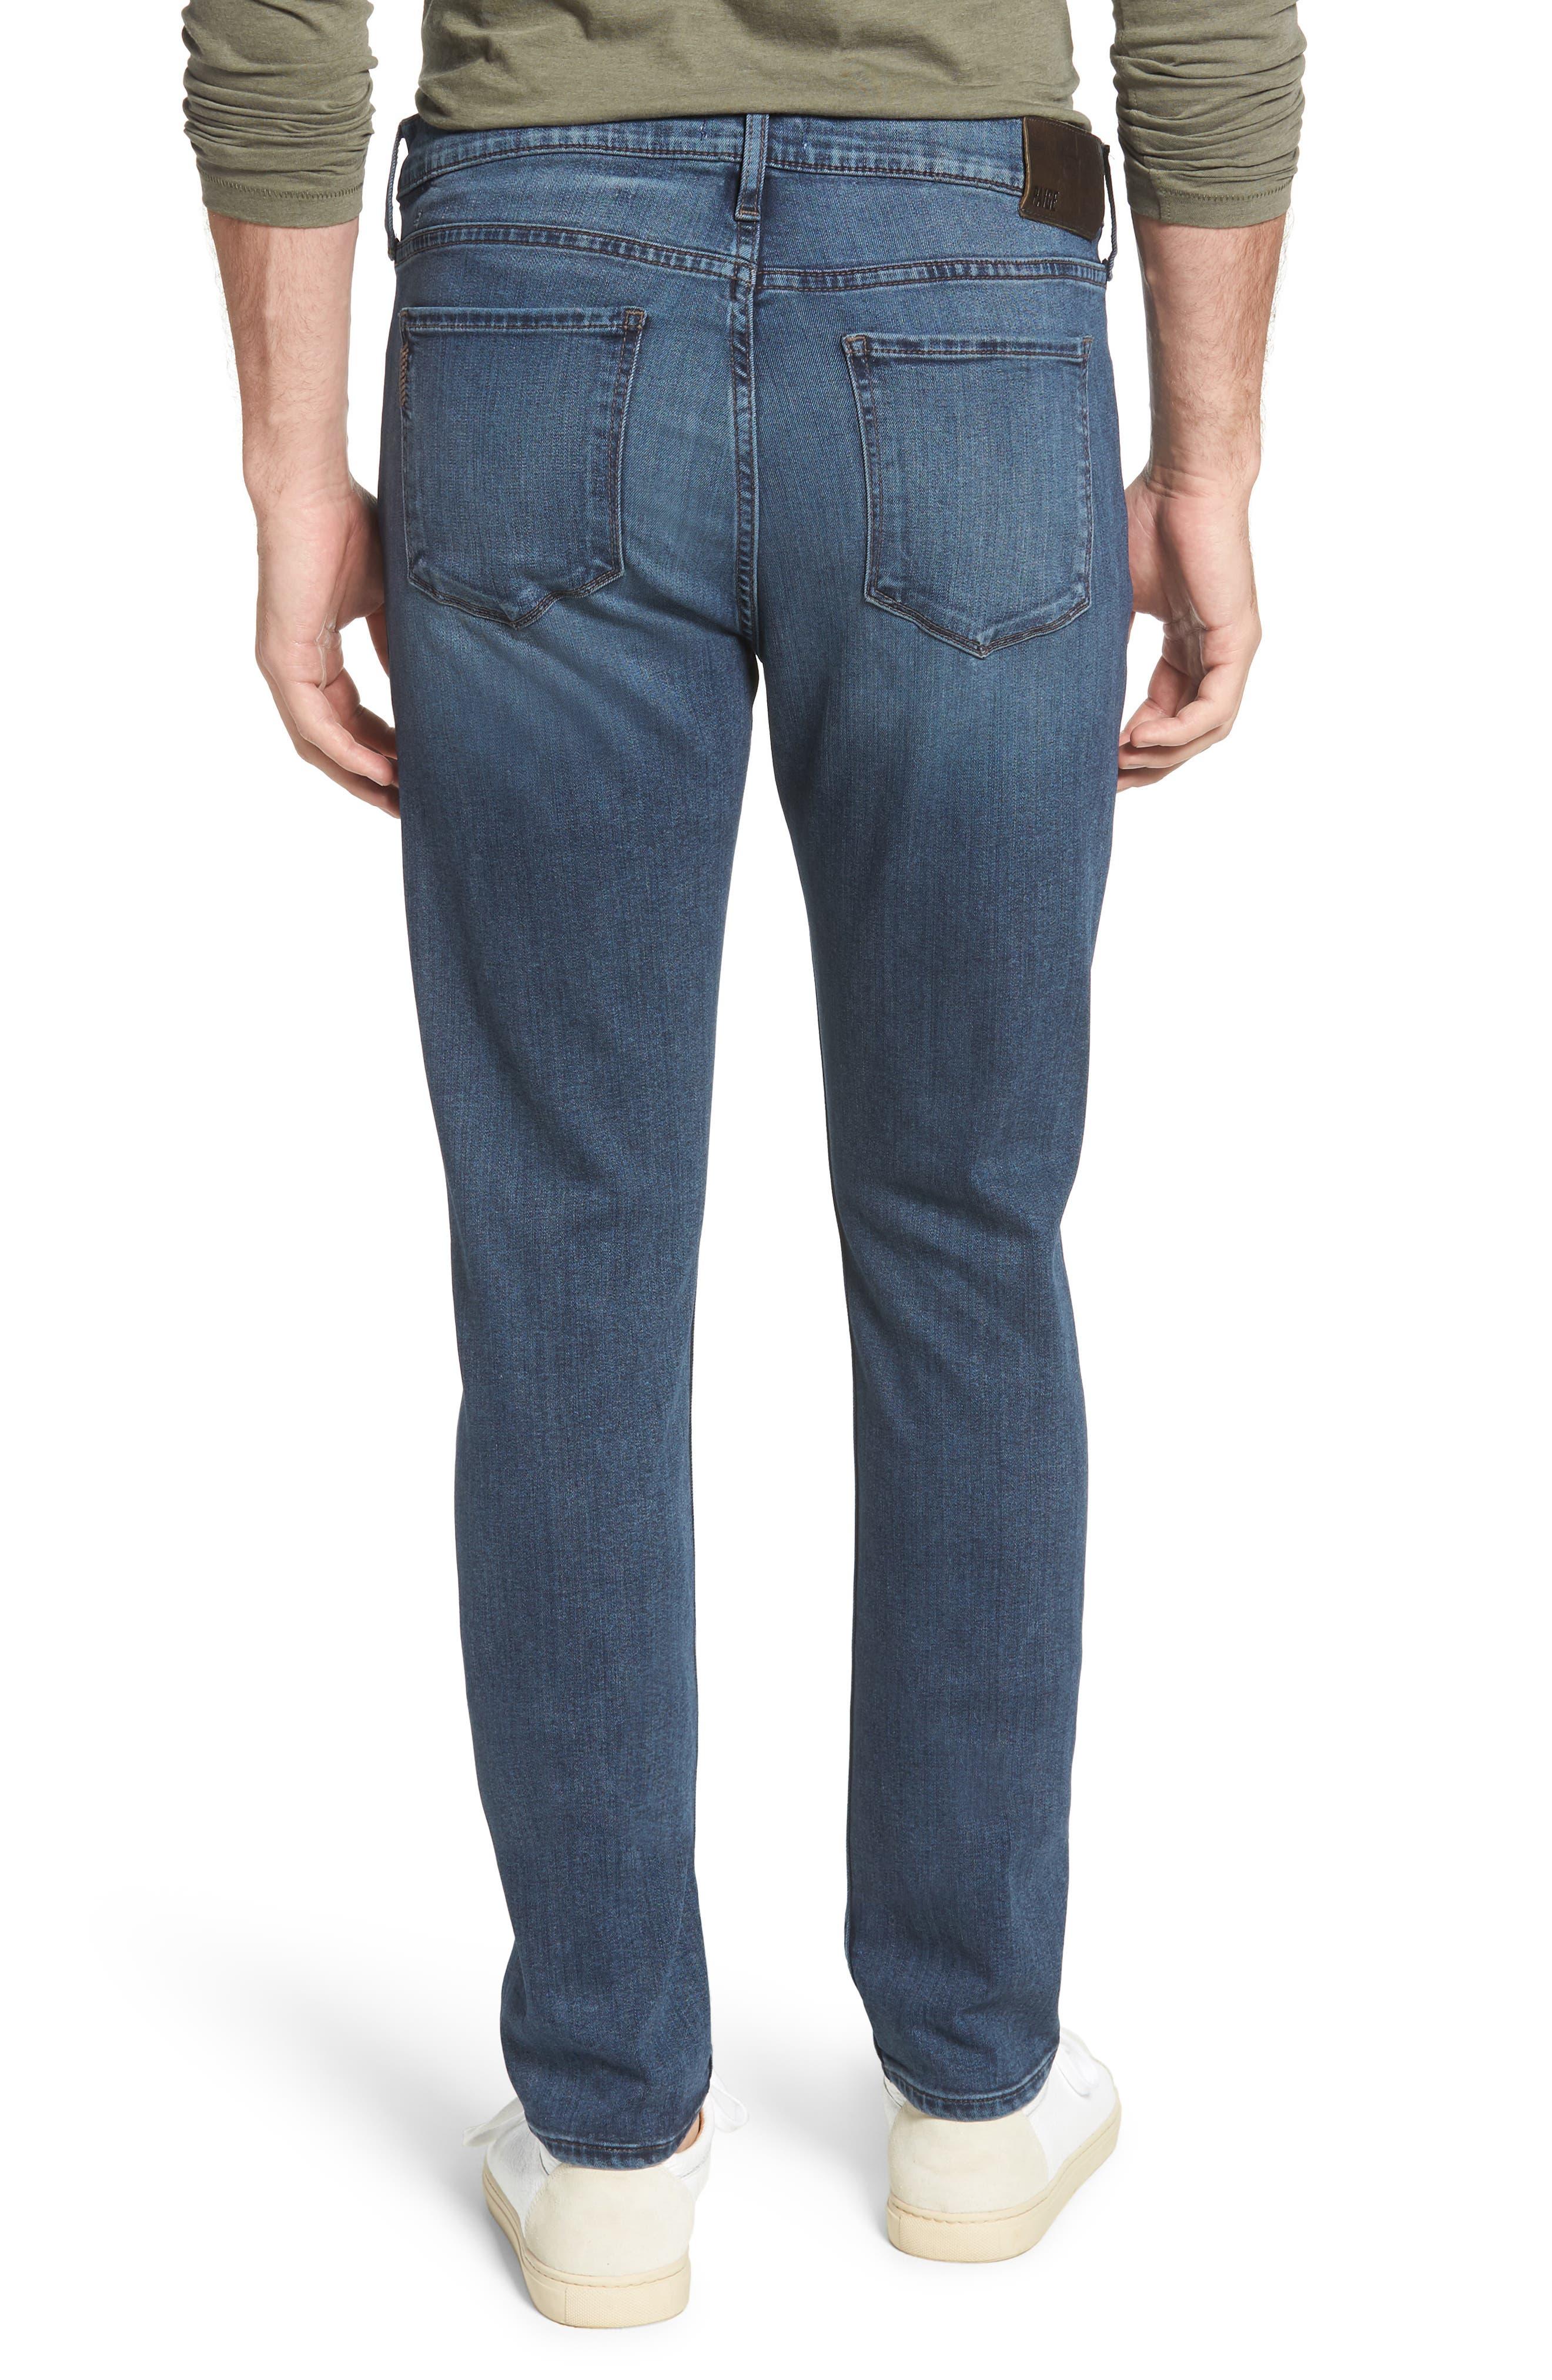 Transcend - Lennox Slim Fit Jeans,                             Alternate thumbnail 2, color,                             GRAMMERCY